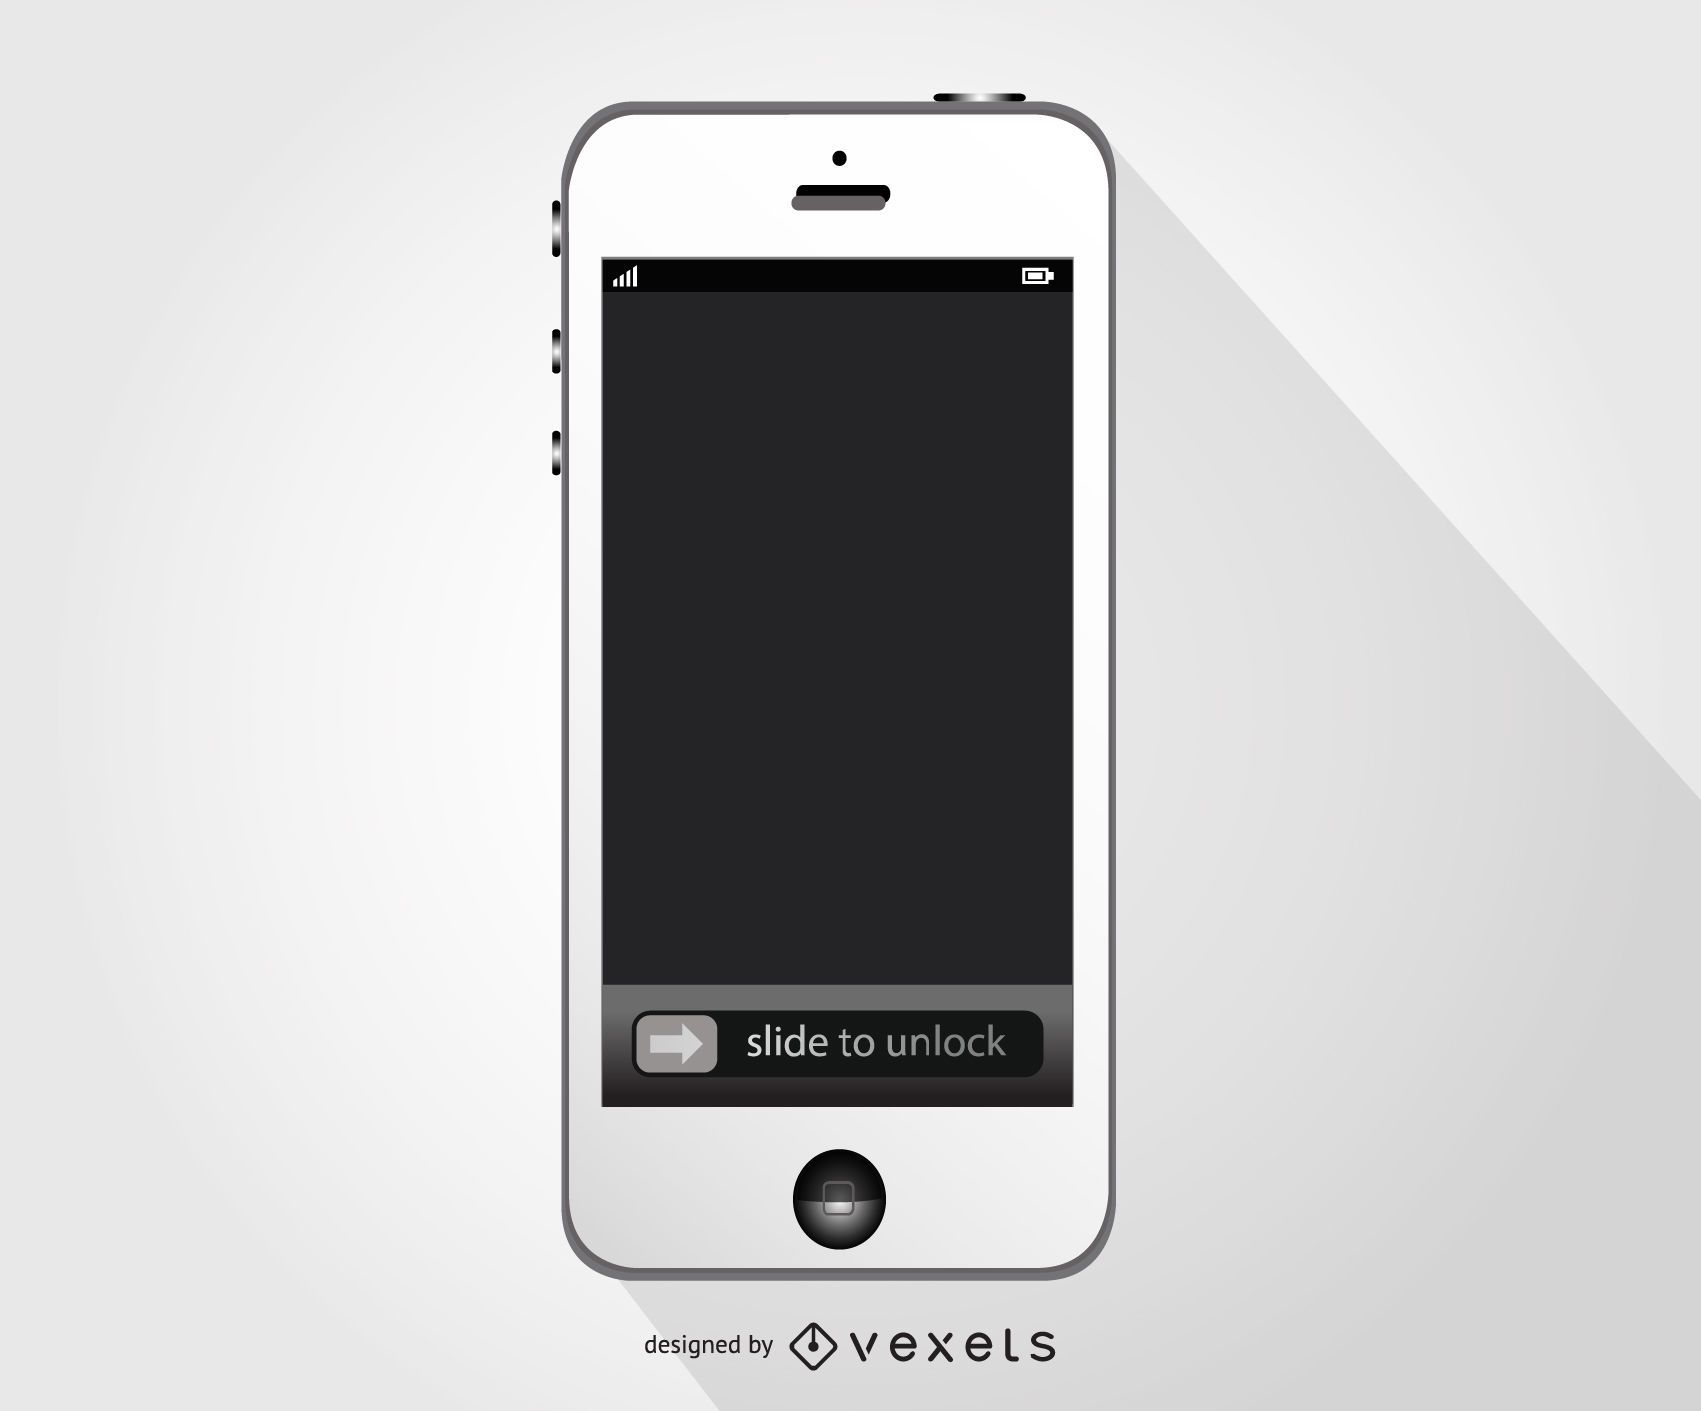 White Iphone smartphone